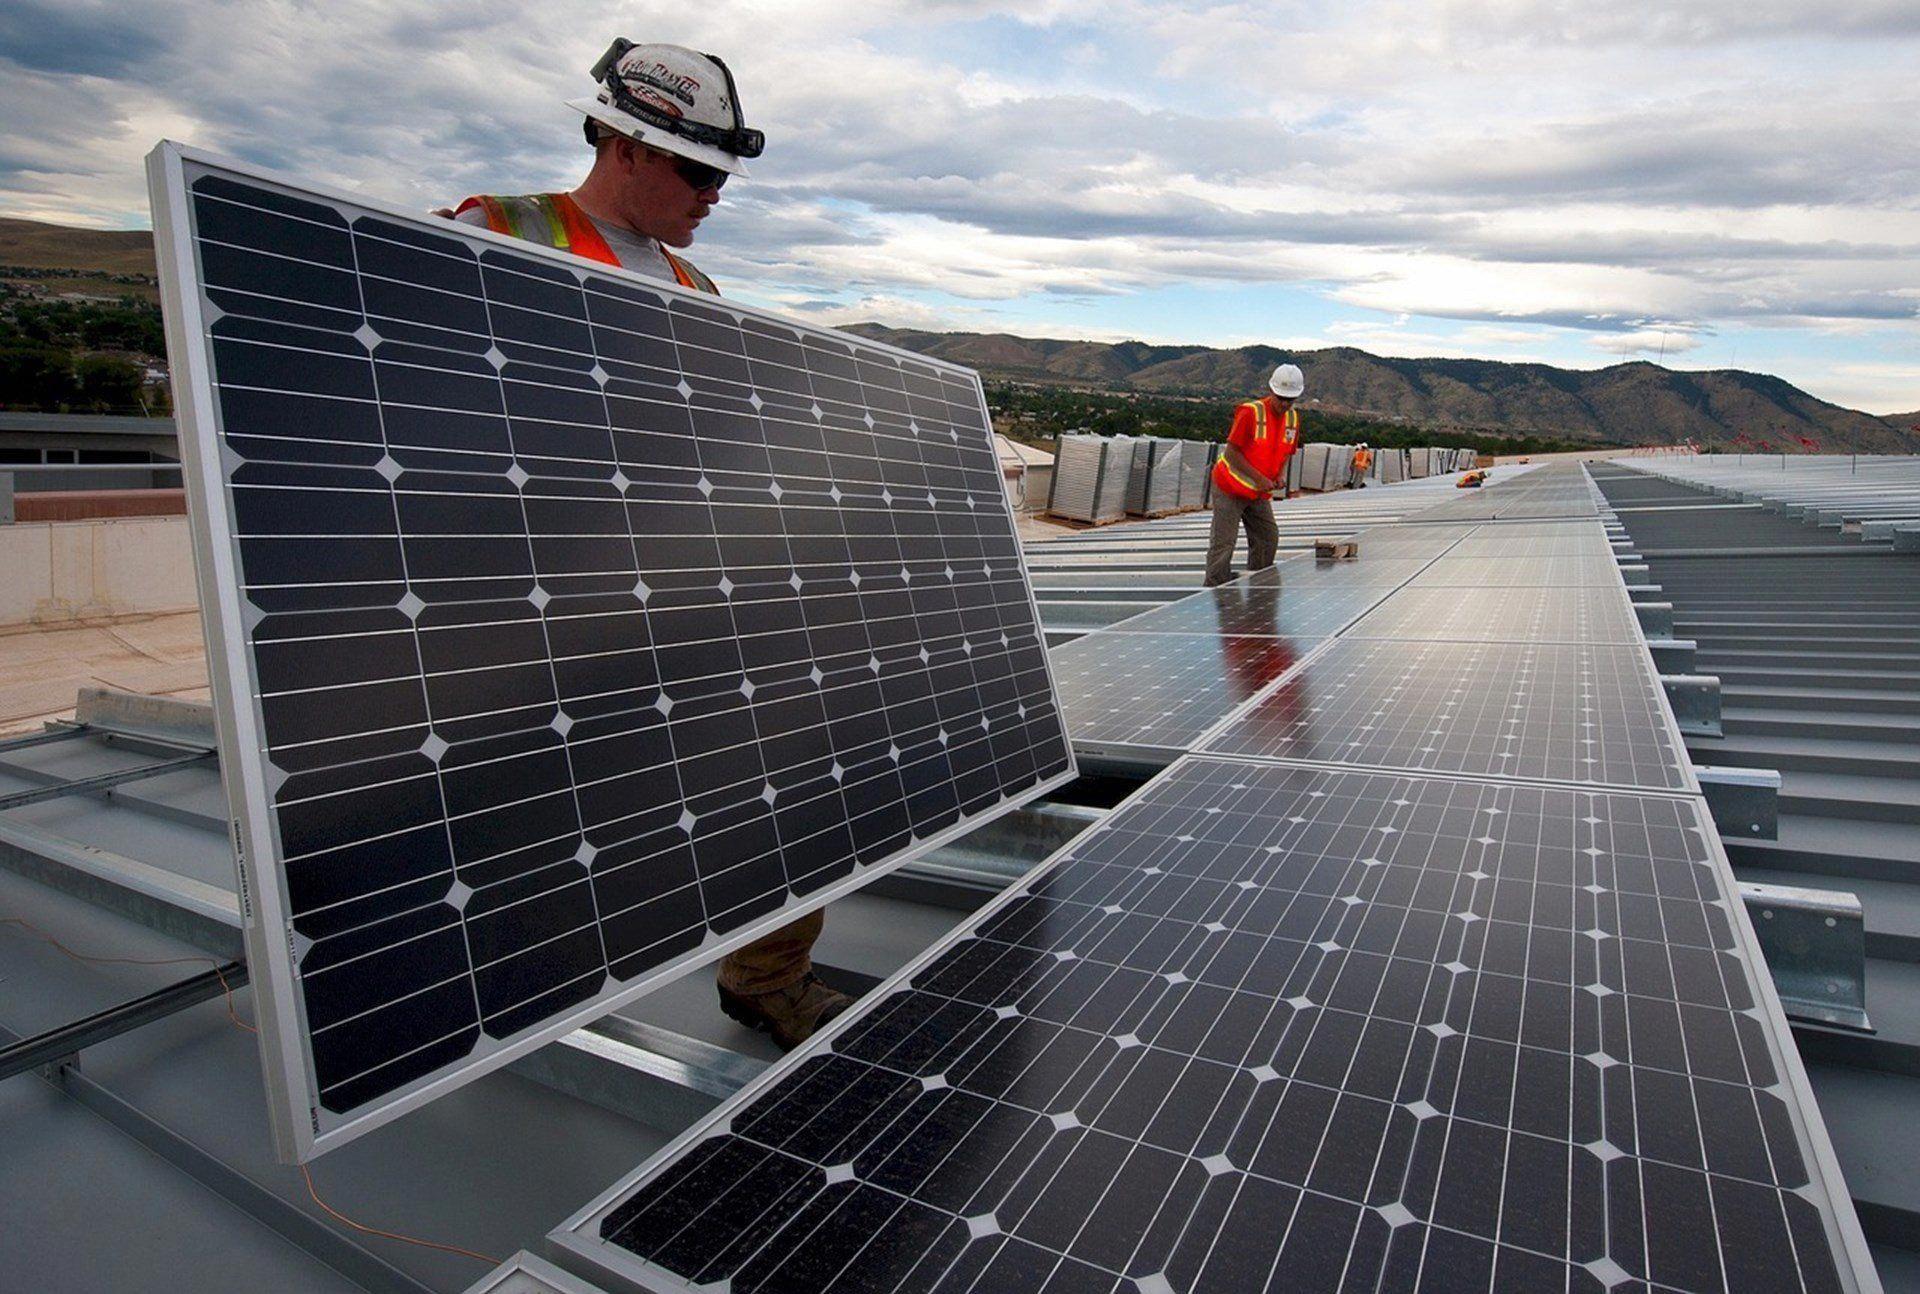 Solar Panels Produce Tons Of Toxic Waste Literally Foundation For Economic Ed En 2020 Instalacion De Paneles Solares Calefaccion Solar Proyectos De Energia Renovable